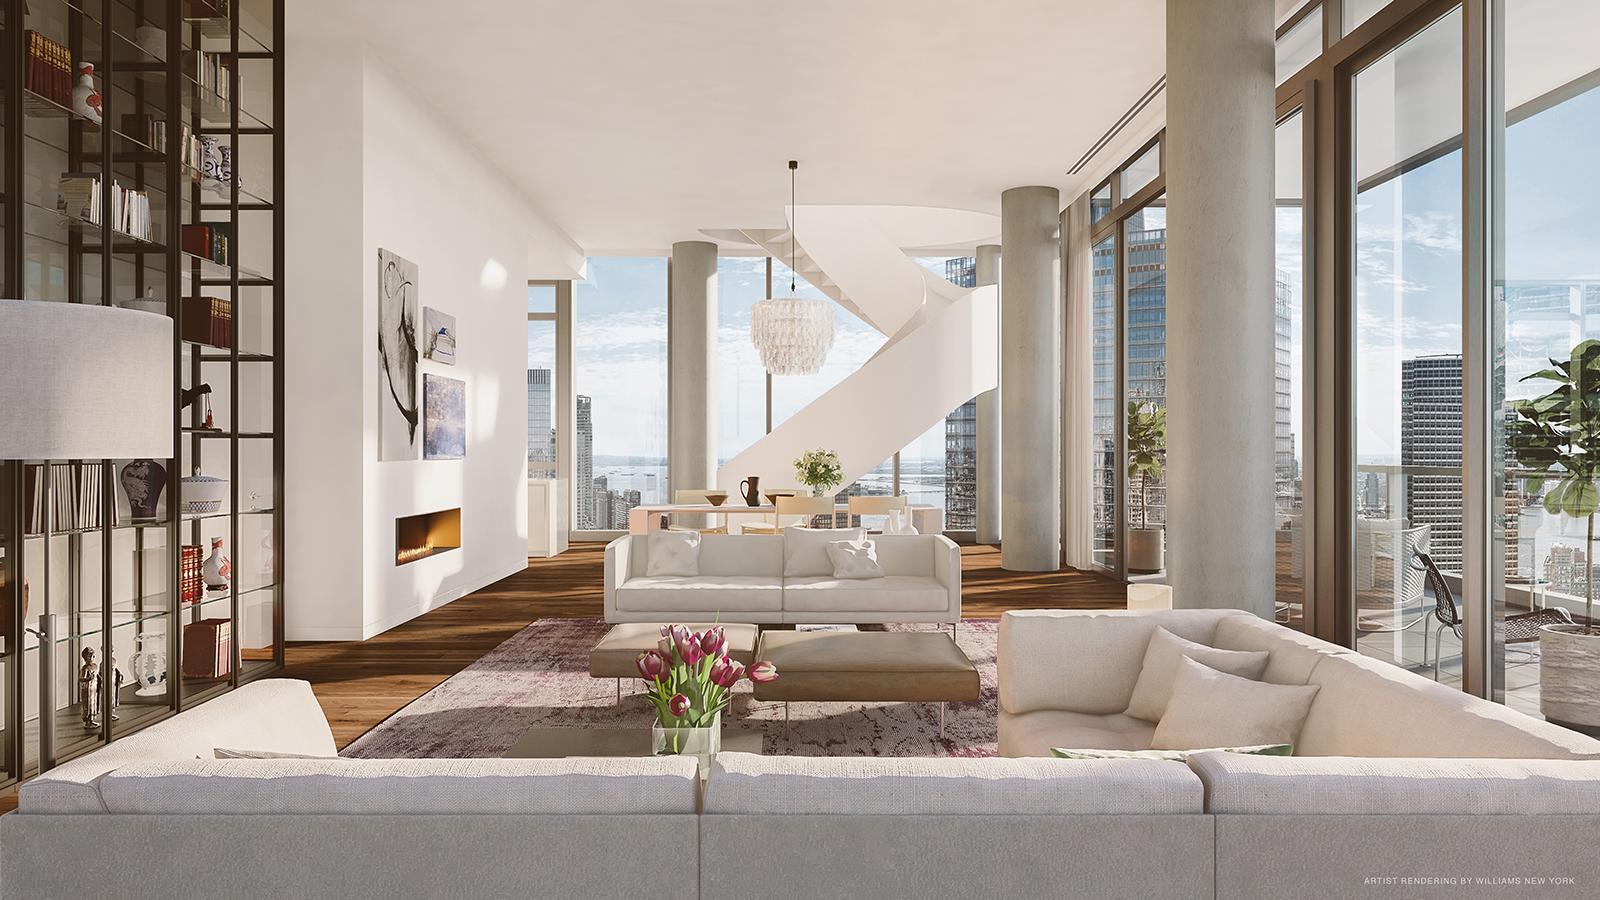 Luxury Property Agency London